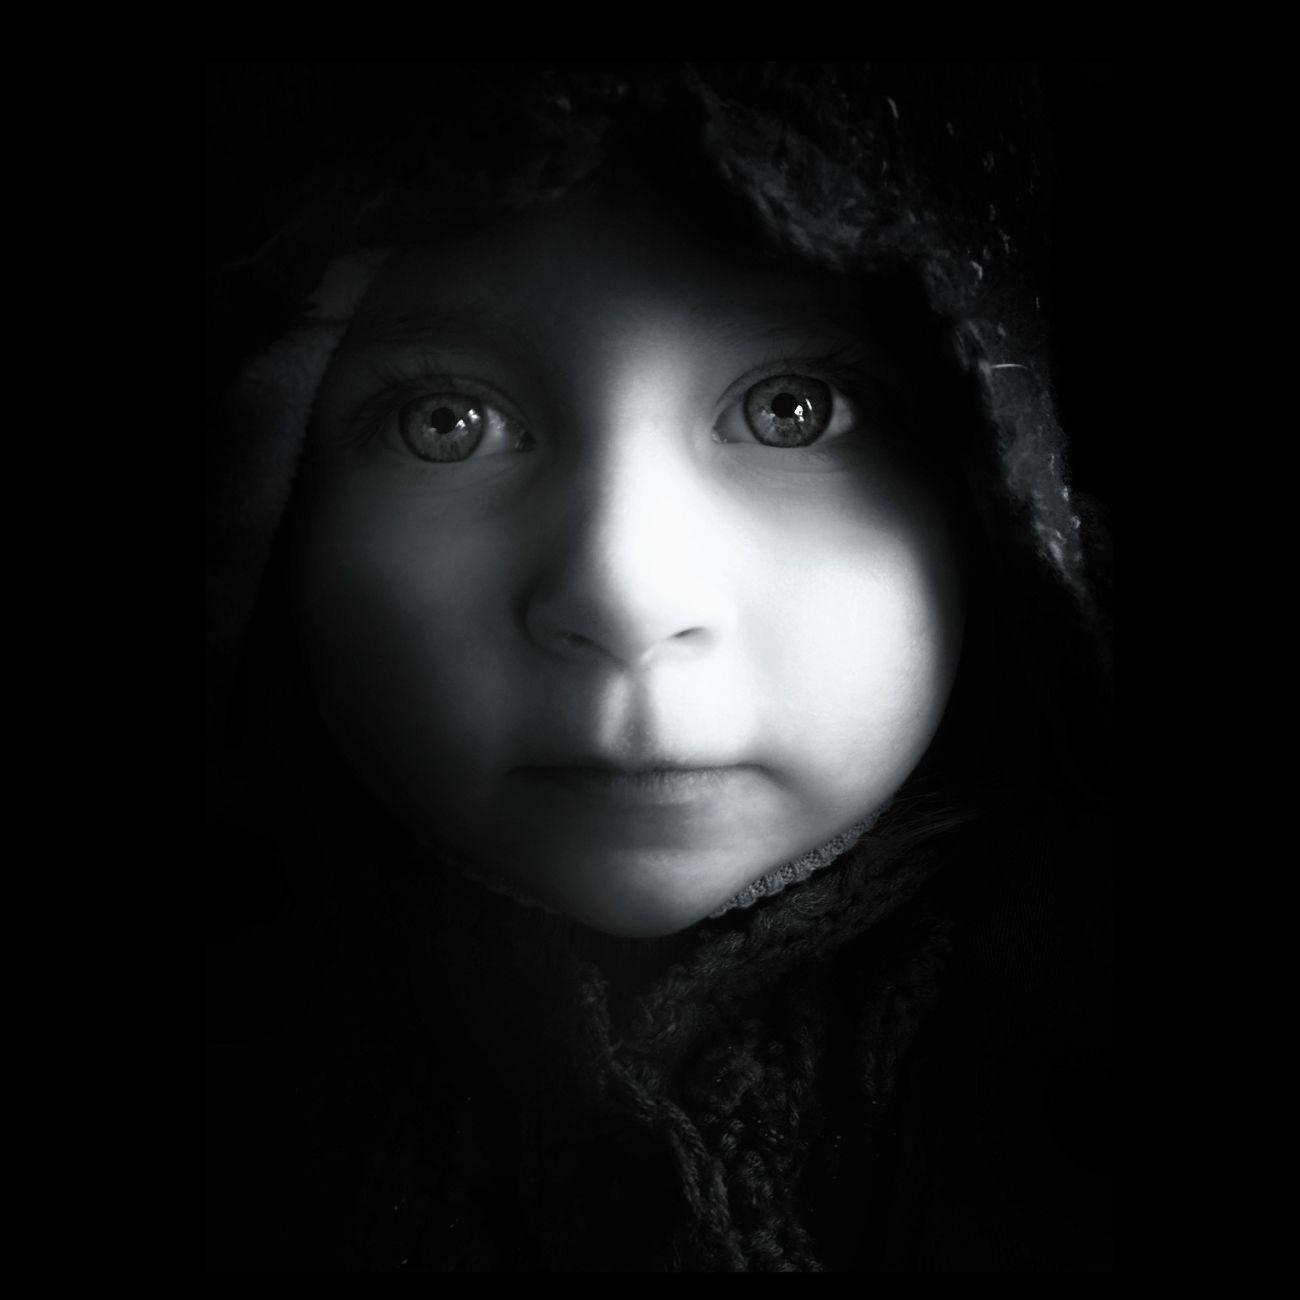 Blackandwhite Shootermag Monochrome Portrait Eye4photography